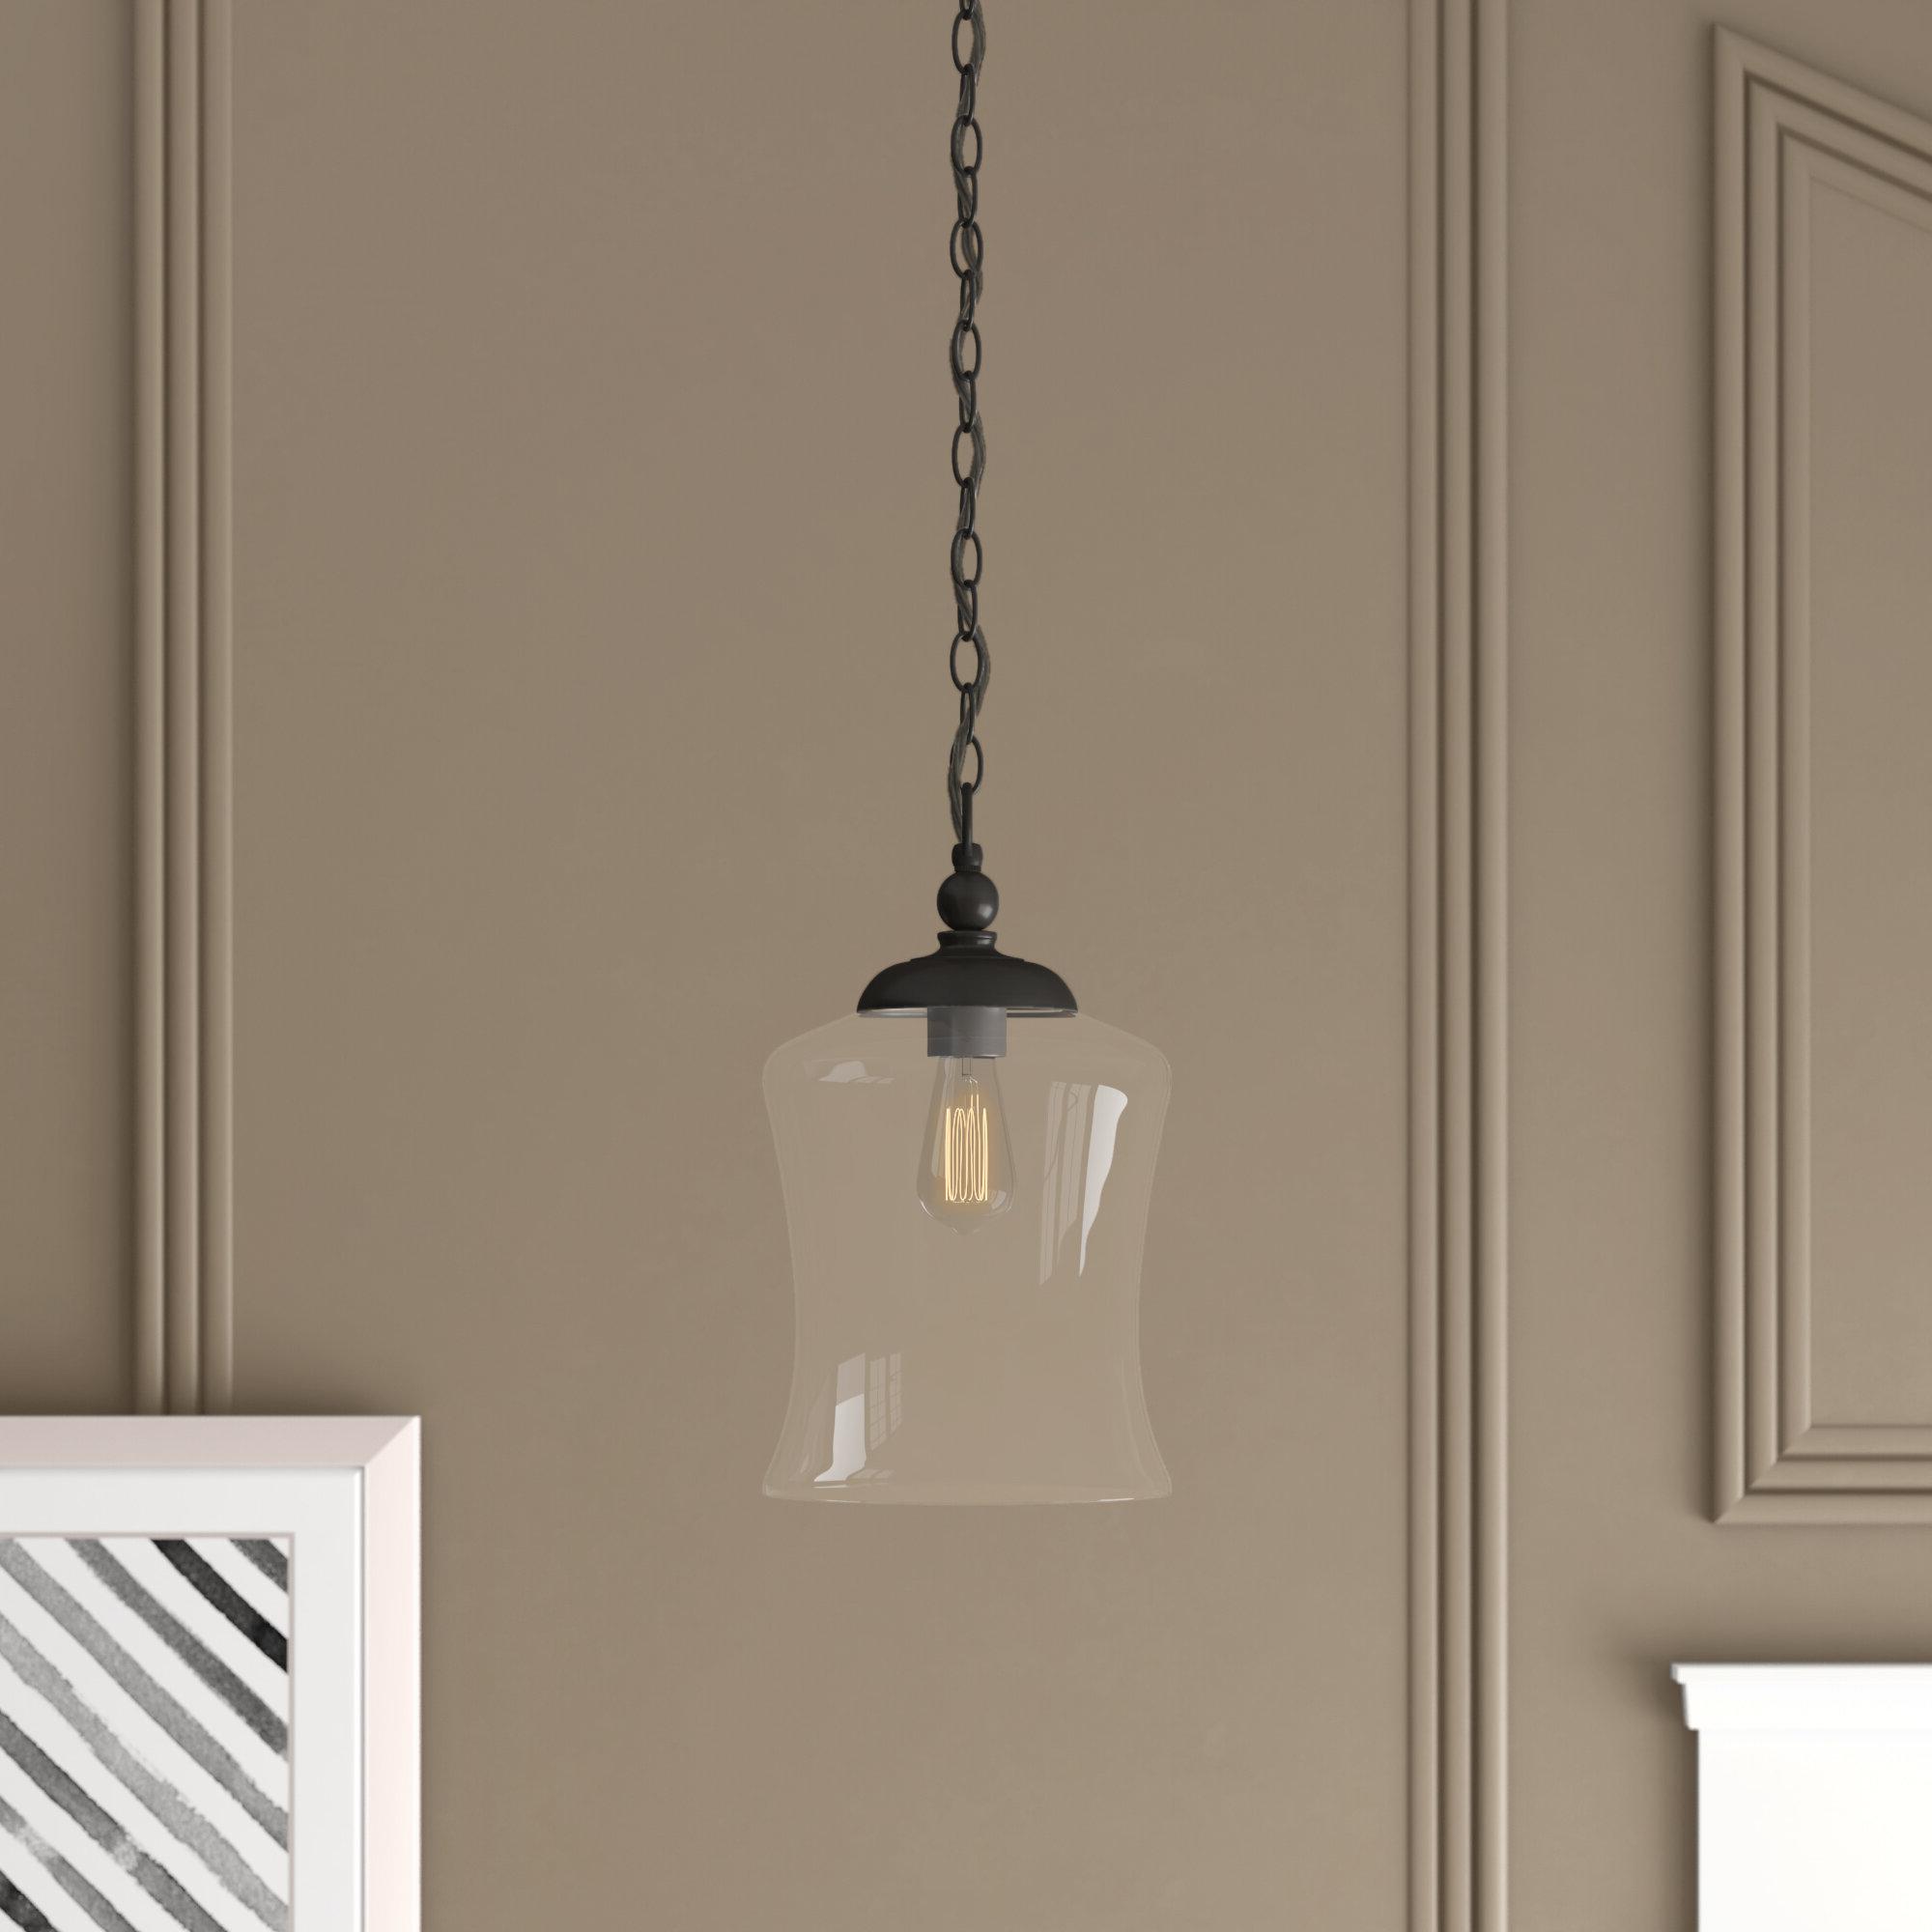 Joss & Main Regarding Giacinta 1 Light Single Bell Pendants (View 16 of 25)